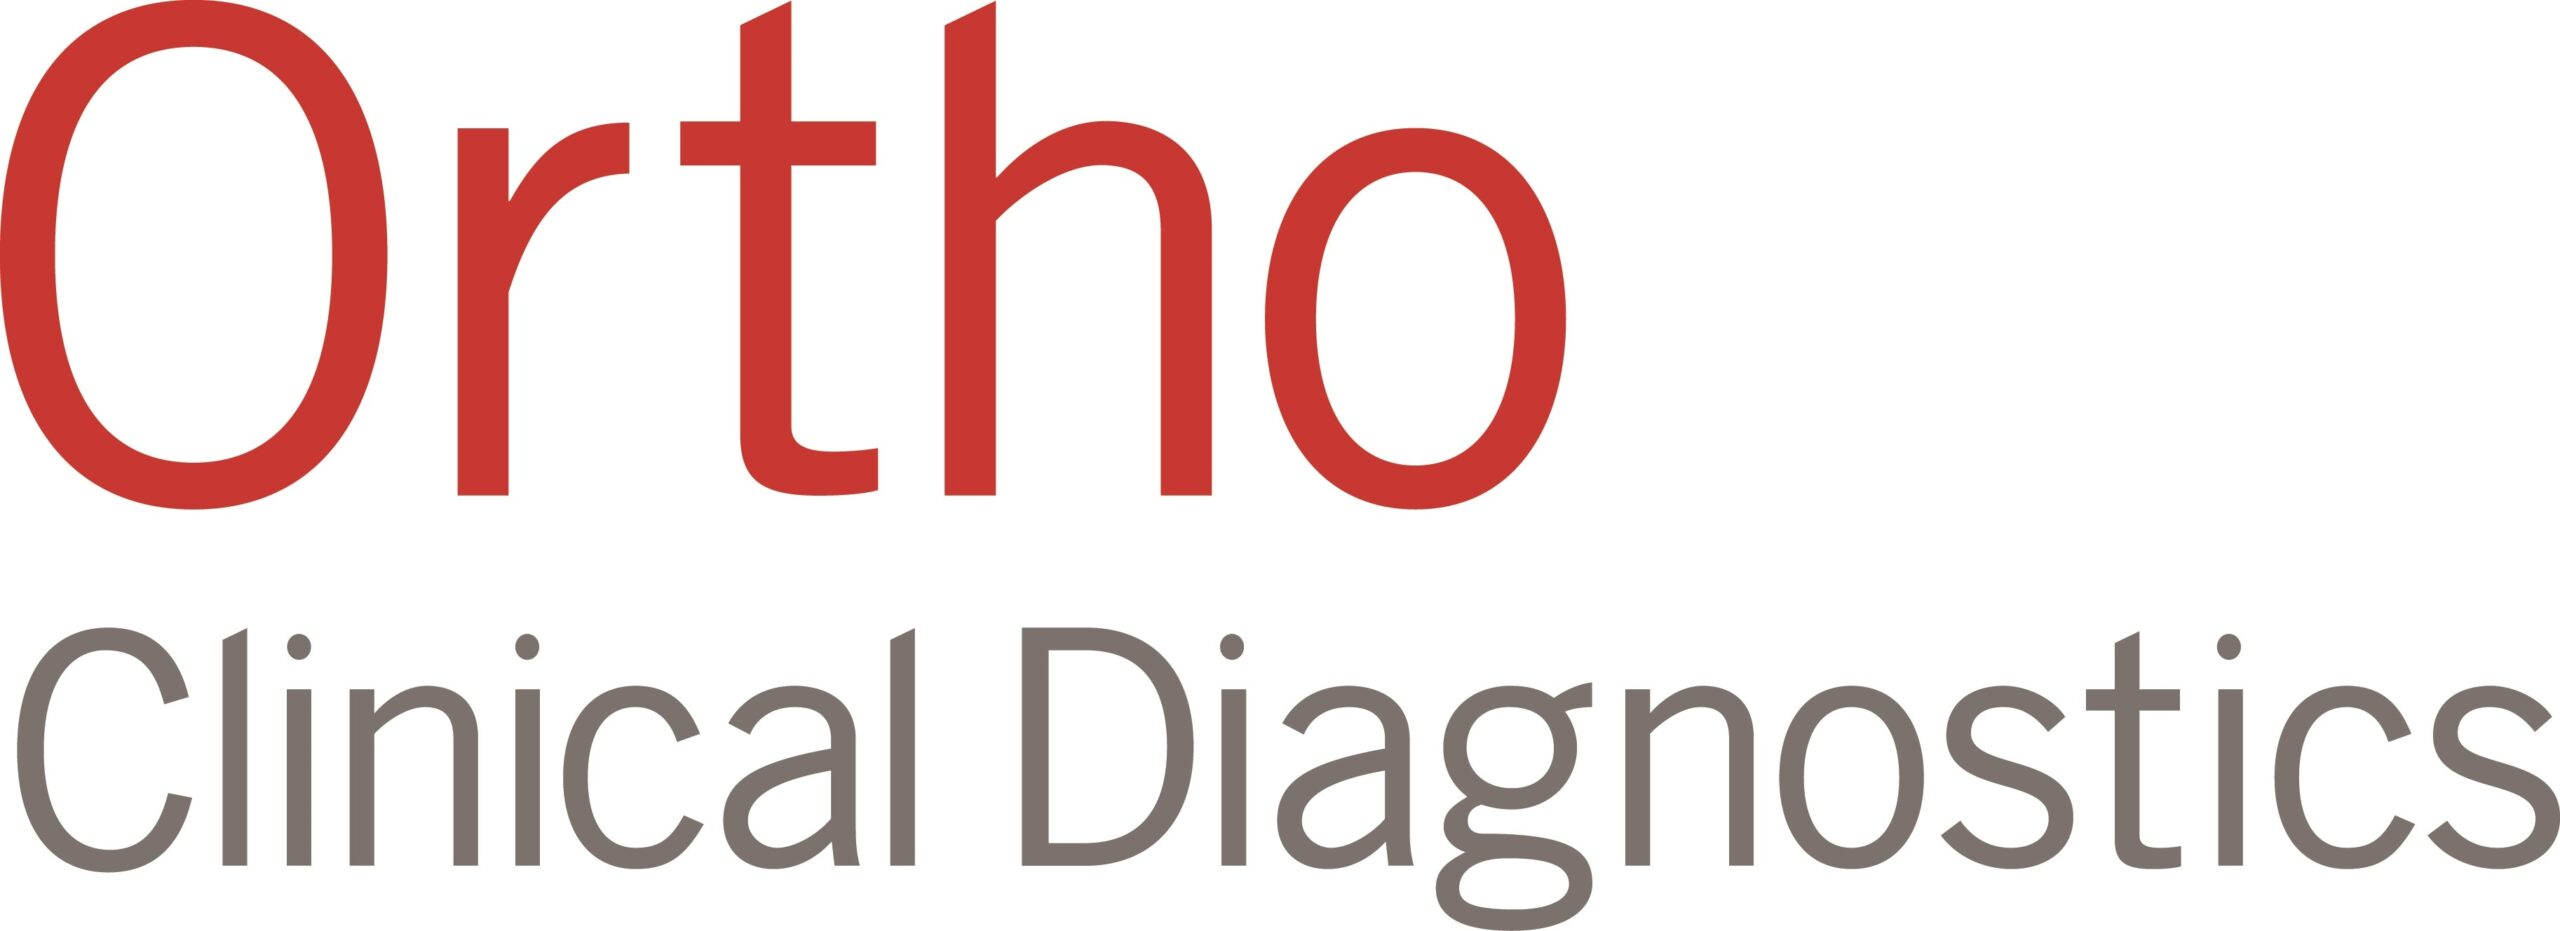 Ortho Clinical Diagnostics IPO